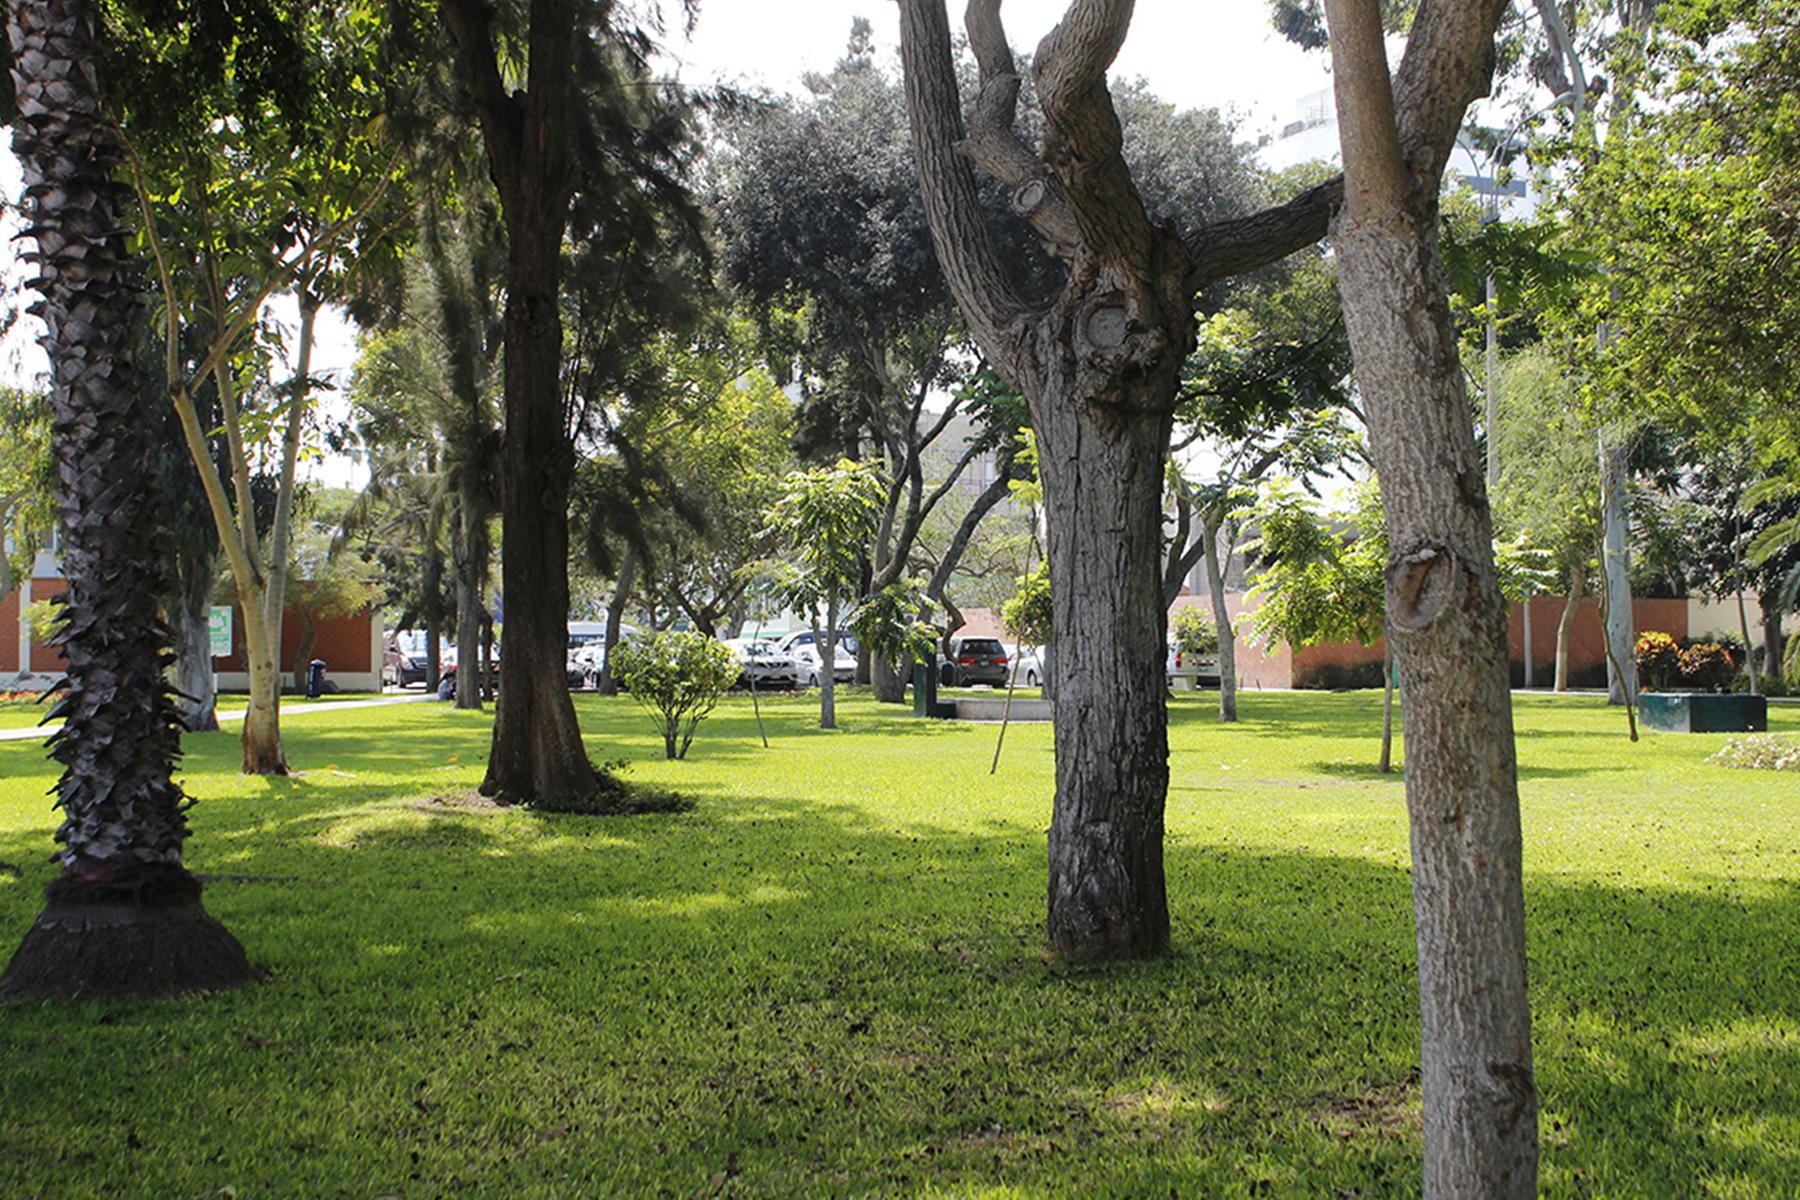 Квартира для того Продажа на Spectacular Project with Park View Miraflores Miguel Aljovin Miraflores, Lima, 18 Перу